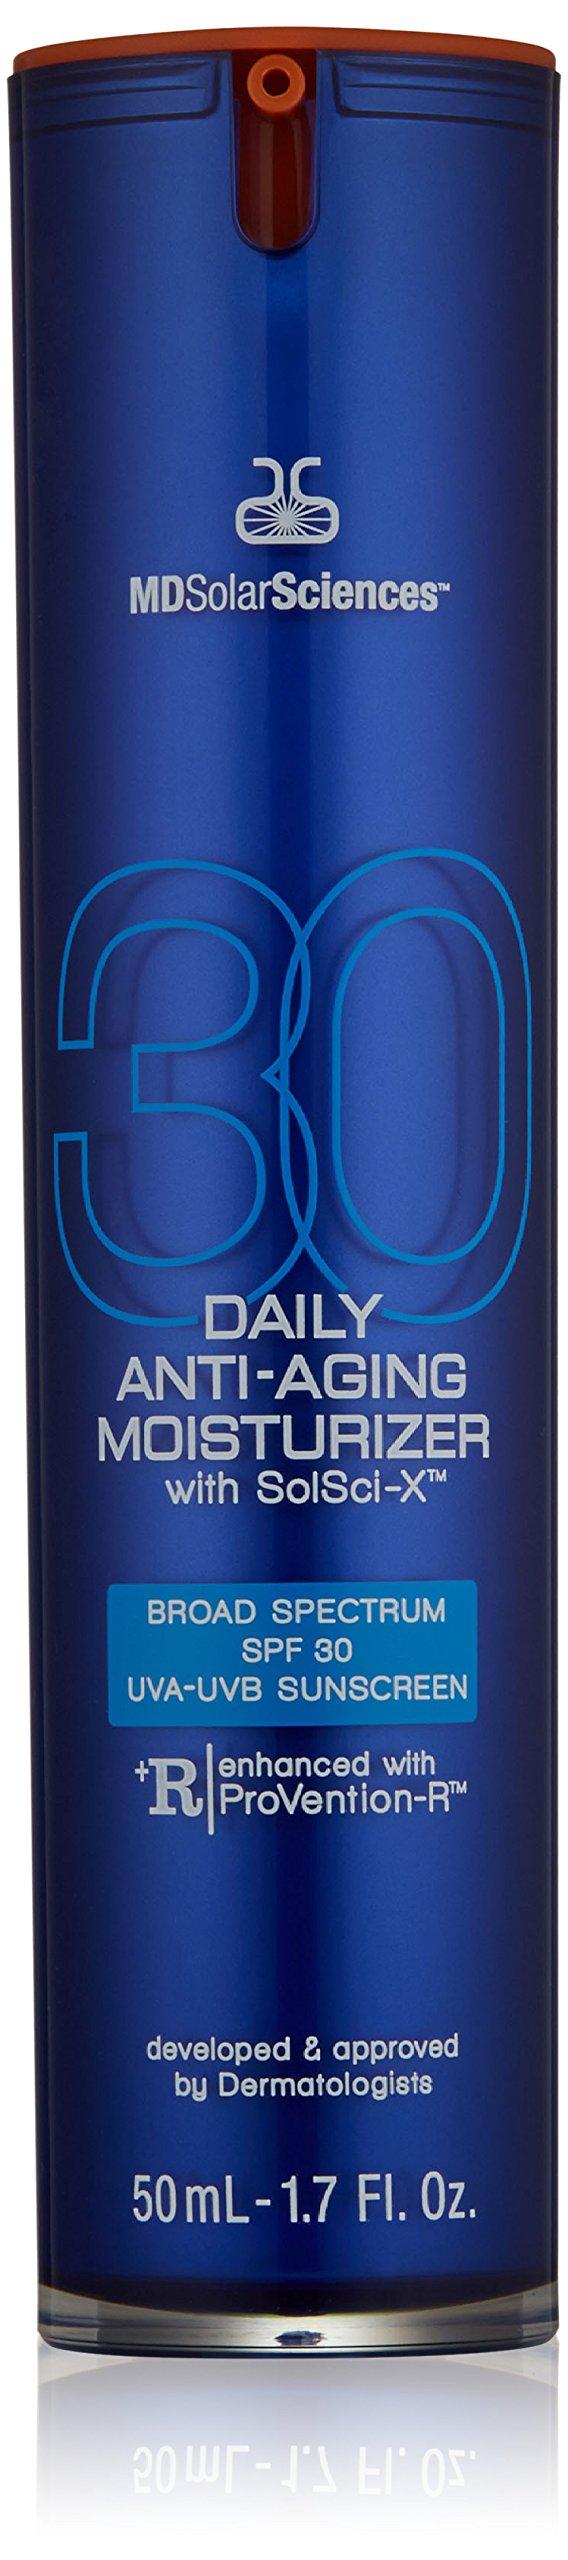 MDSolarSciences Daily Anti-Aging Broad Spectrum SPF 30 Moisturizer, 1.7 fl.oz. by MDSolarSciences